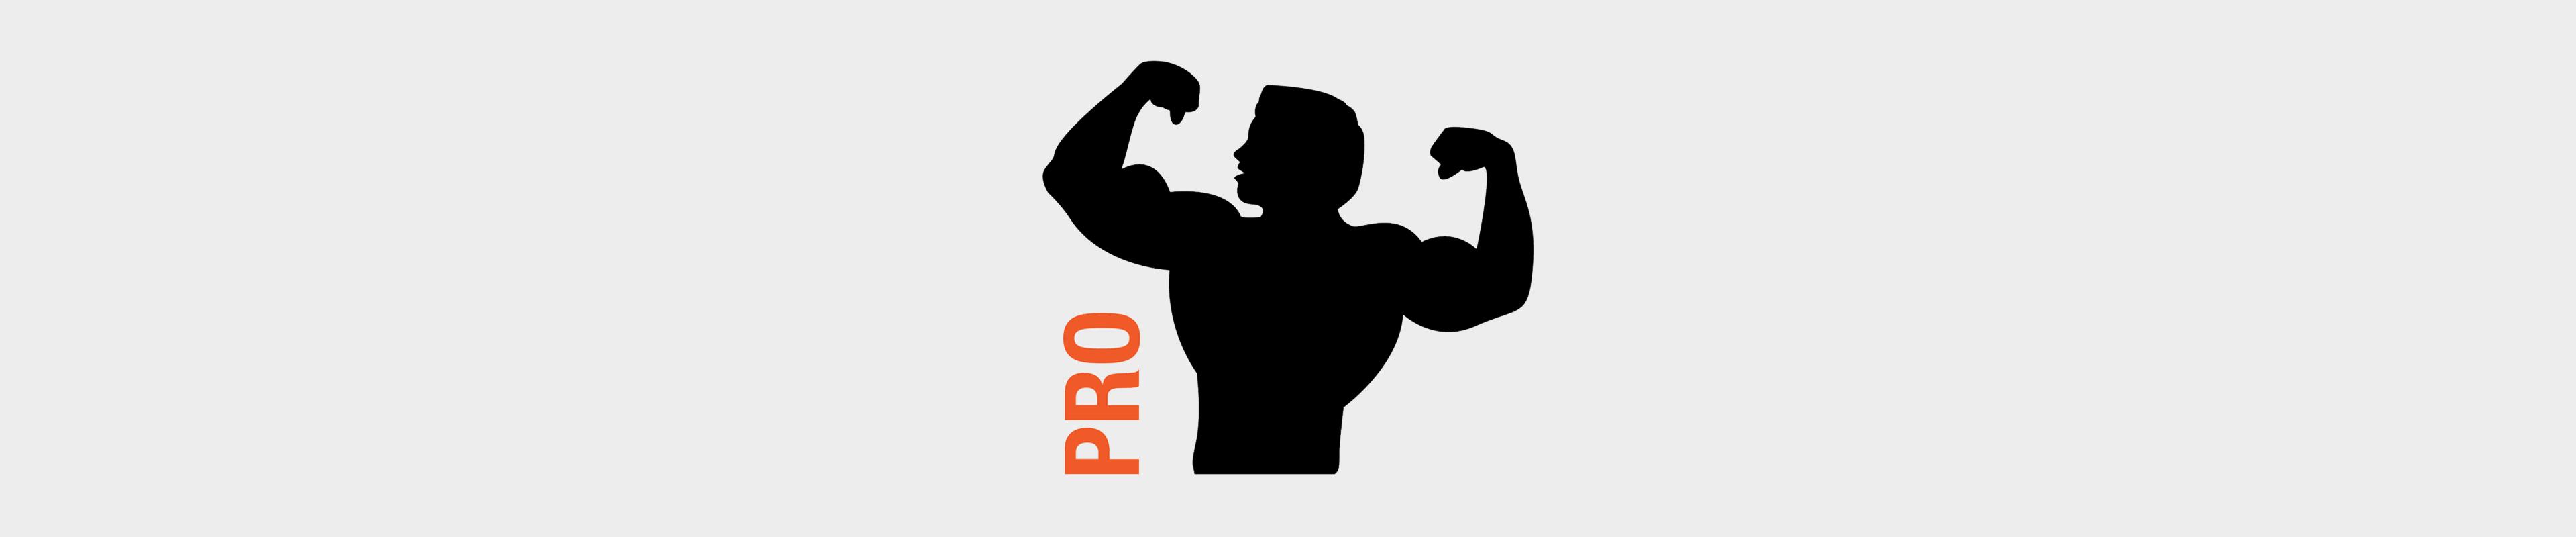 [已购]Fitness Point Pro-草蜢资源